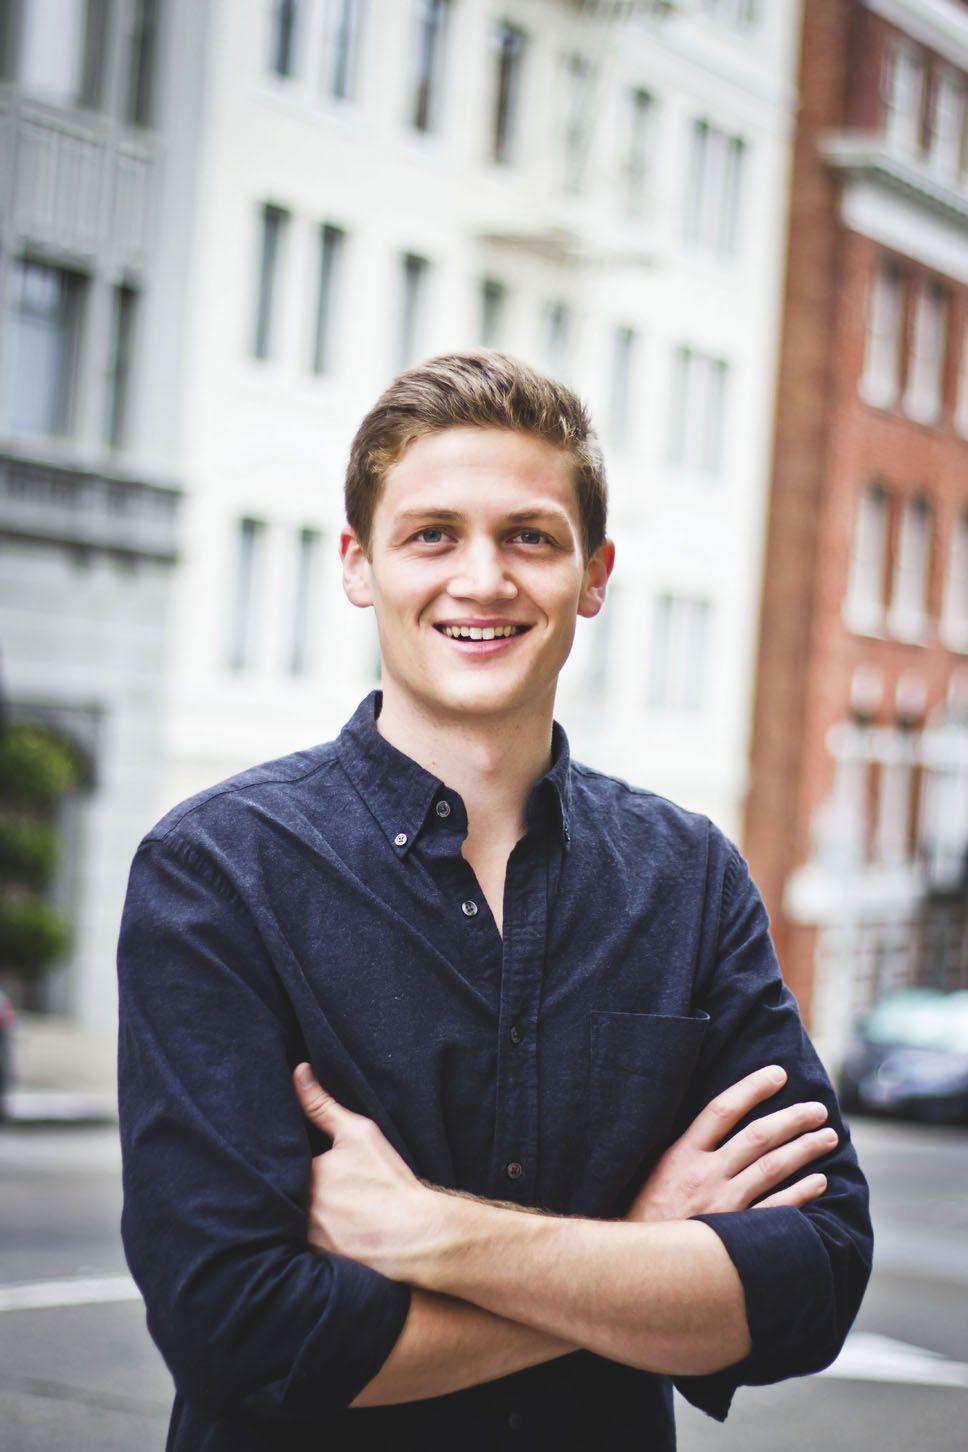 Jessie Clapp Photography Chris Headshots Professional Business Realestate Photogra Headshots Professional Business Photoshoot Portrait Photography Men